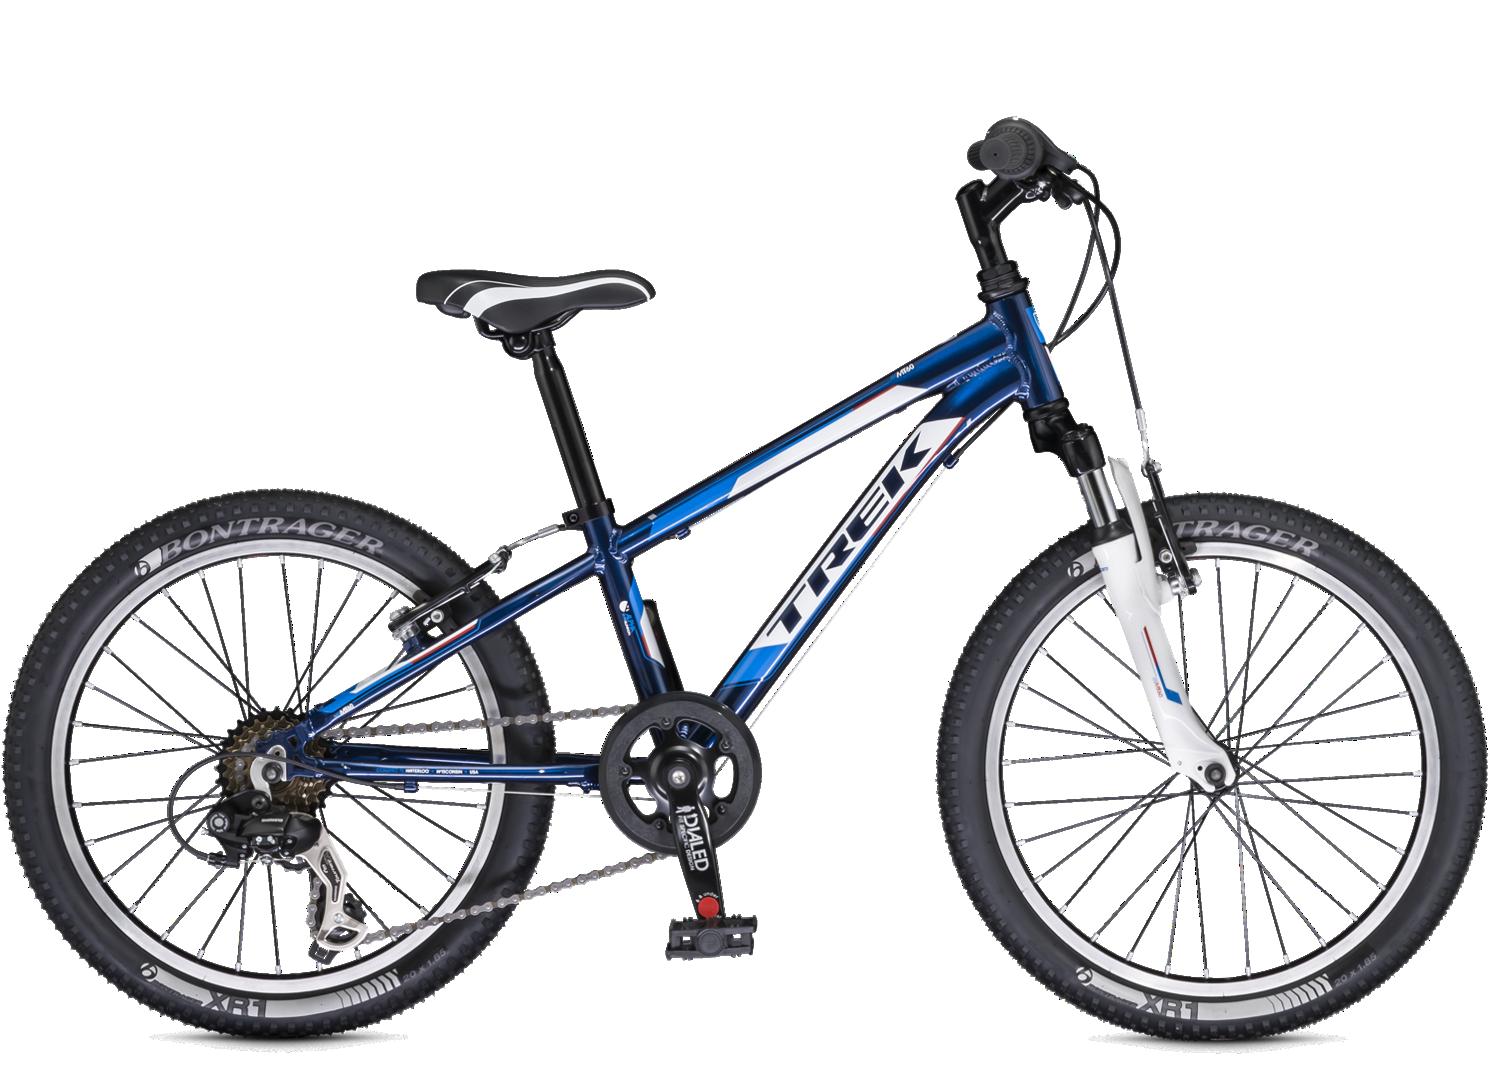 87e4ea6e5 MT 60 Boy s - Kids  collection - Trek Bicycle